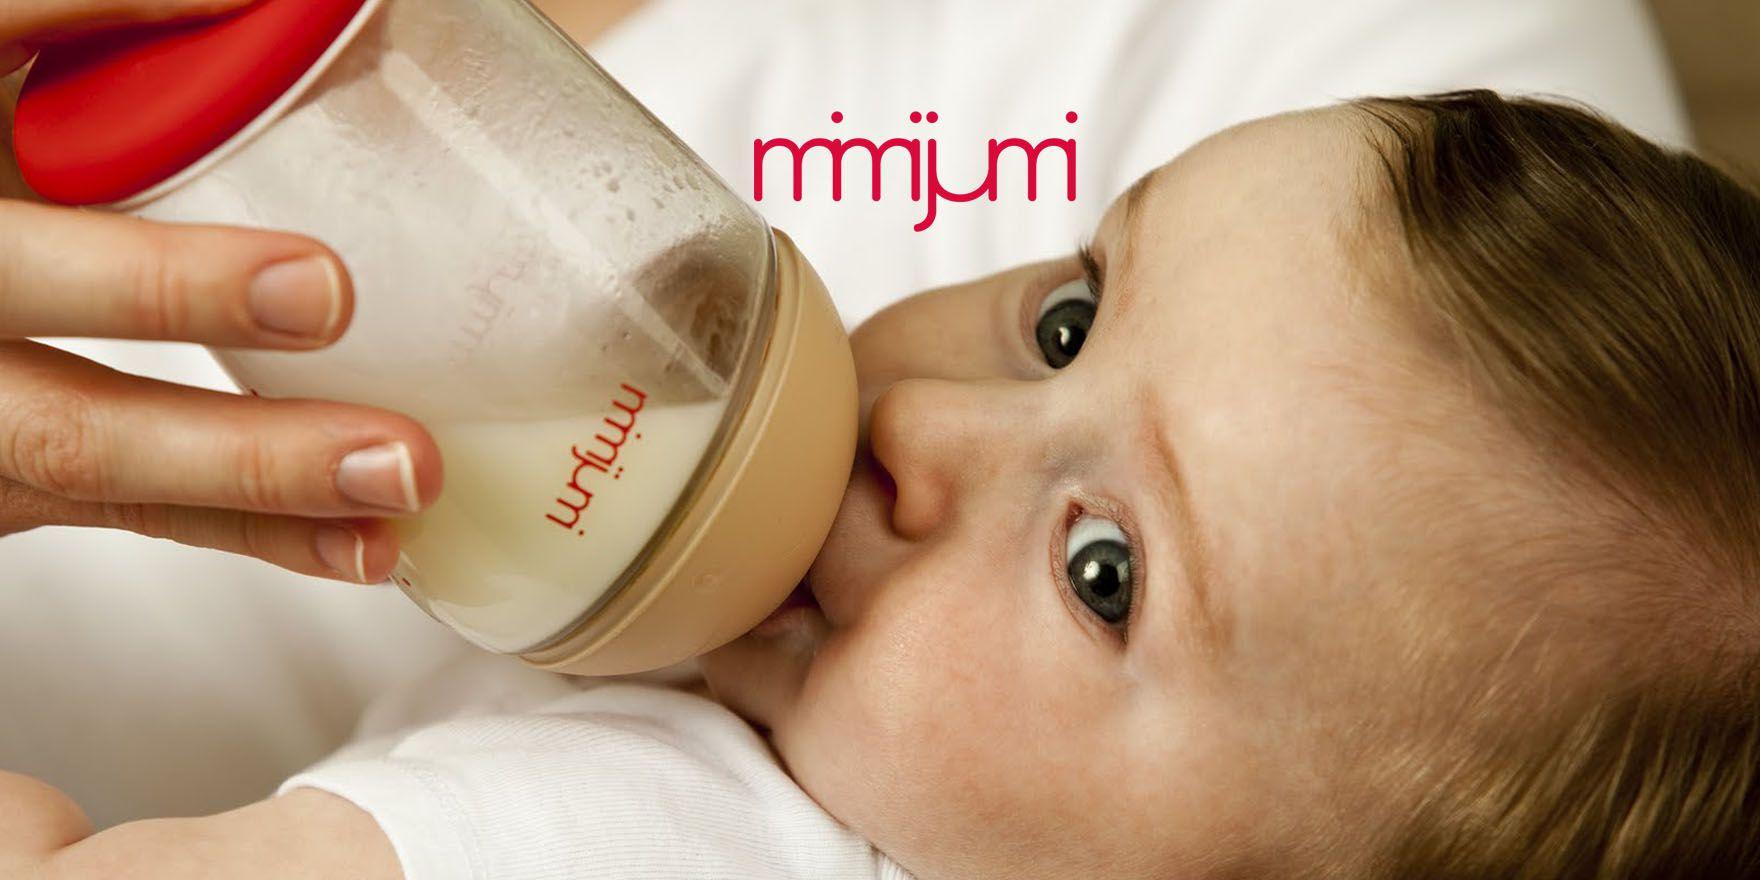 mimijumi_s1_000